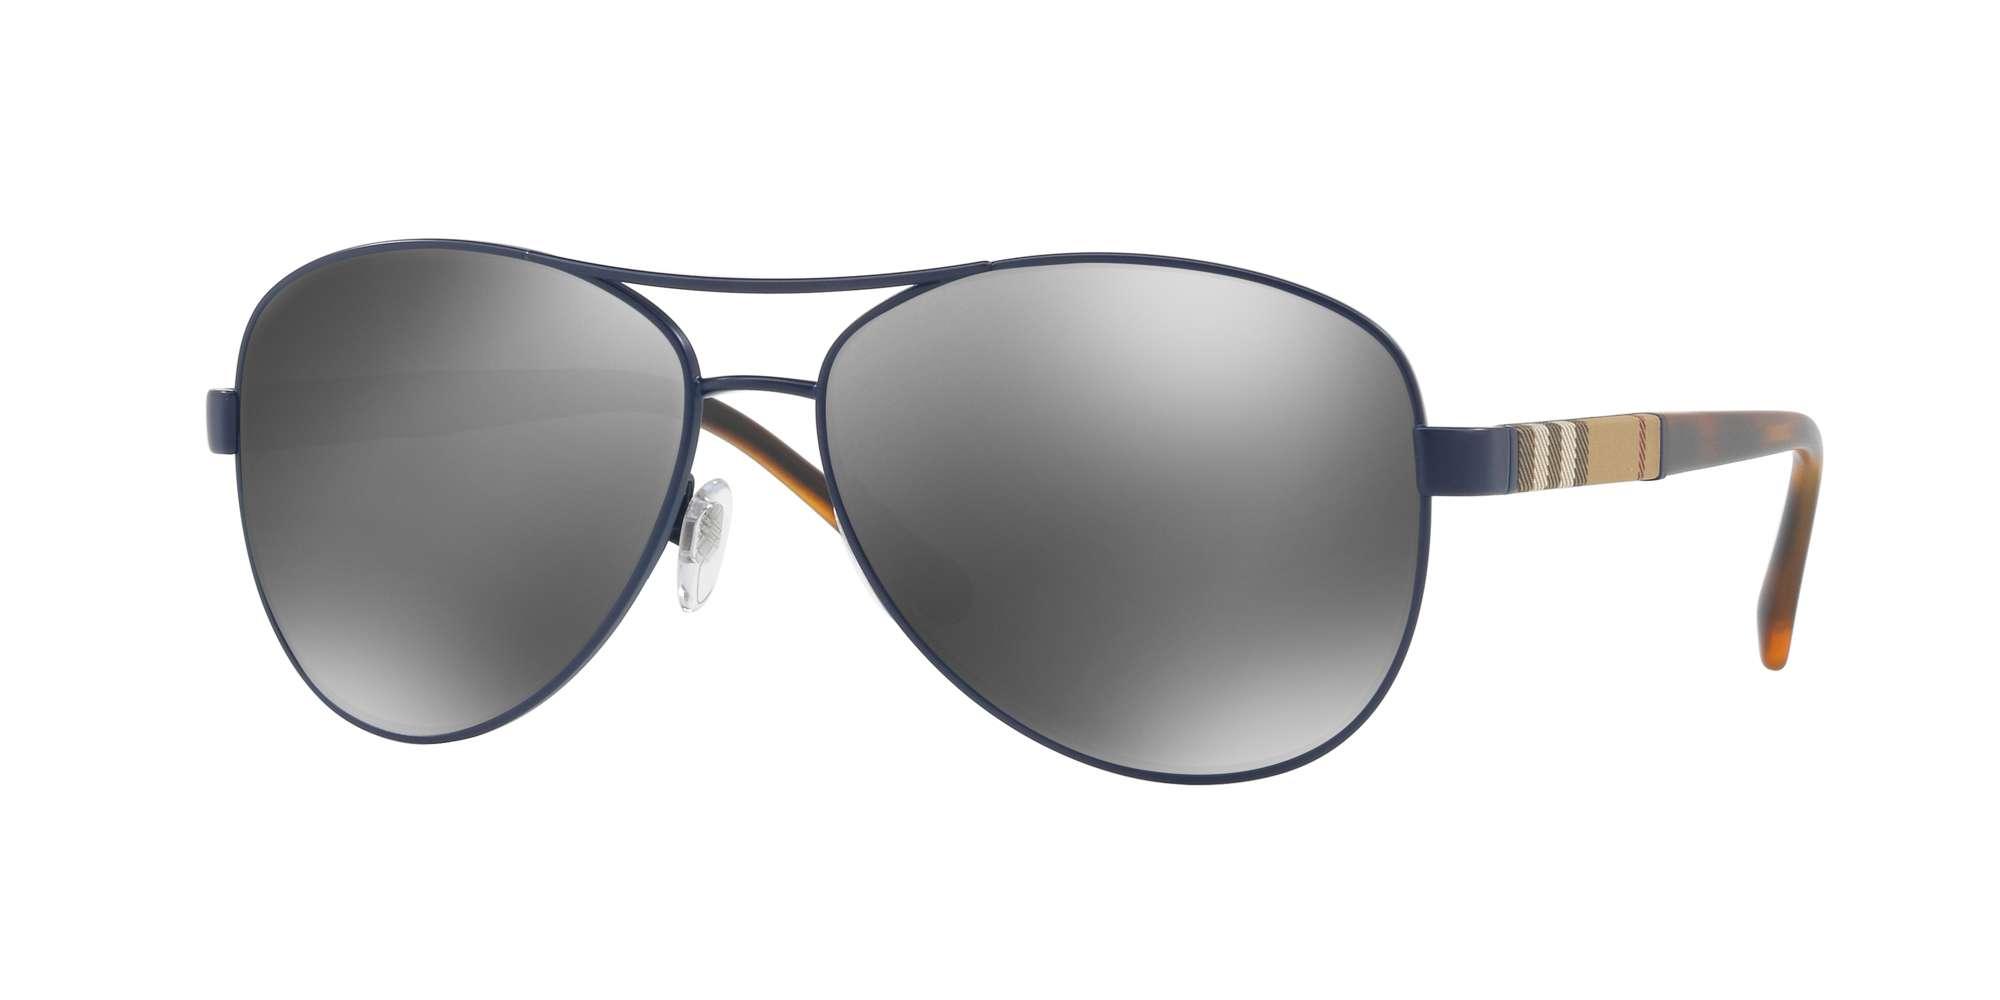 MATTE BLUE / GREY MIRROR SILVER lenses